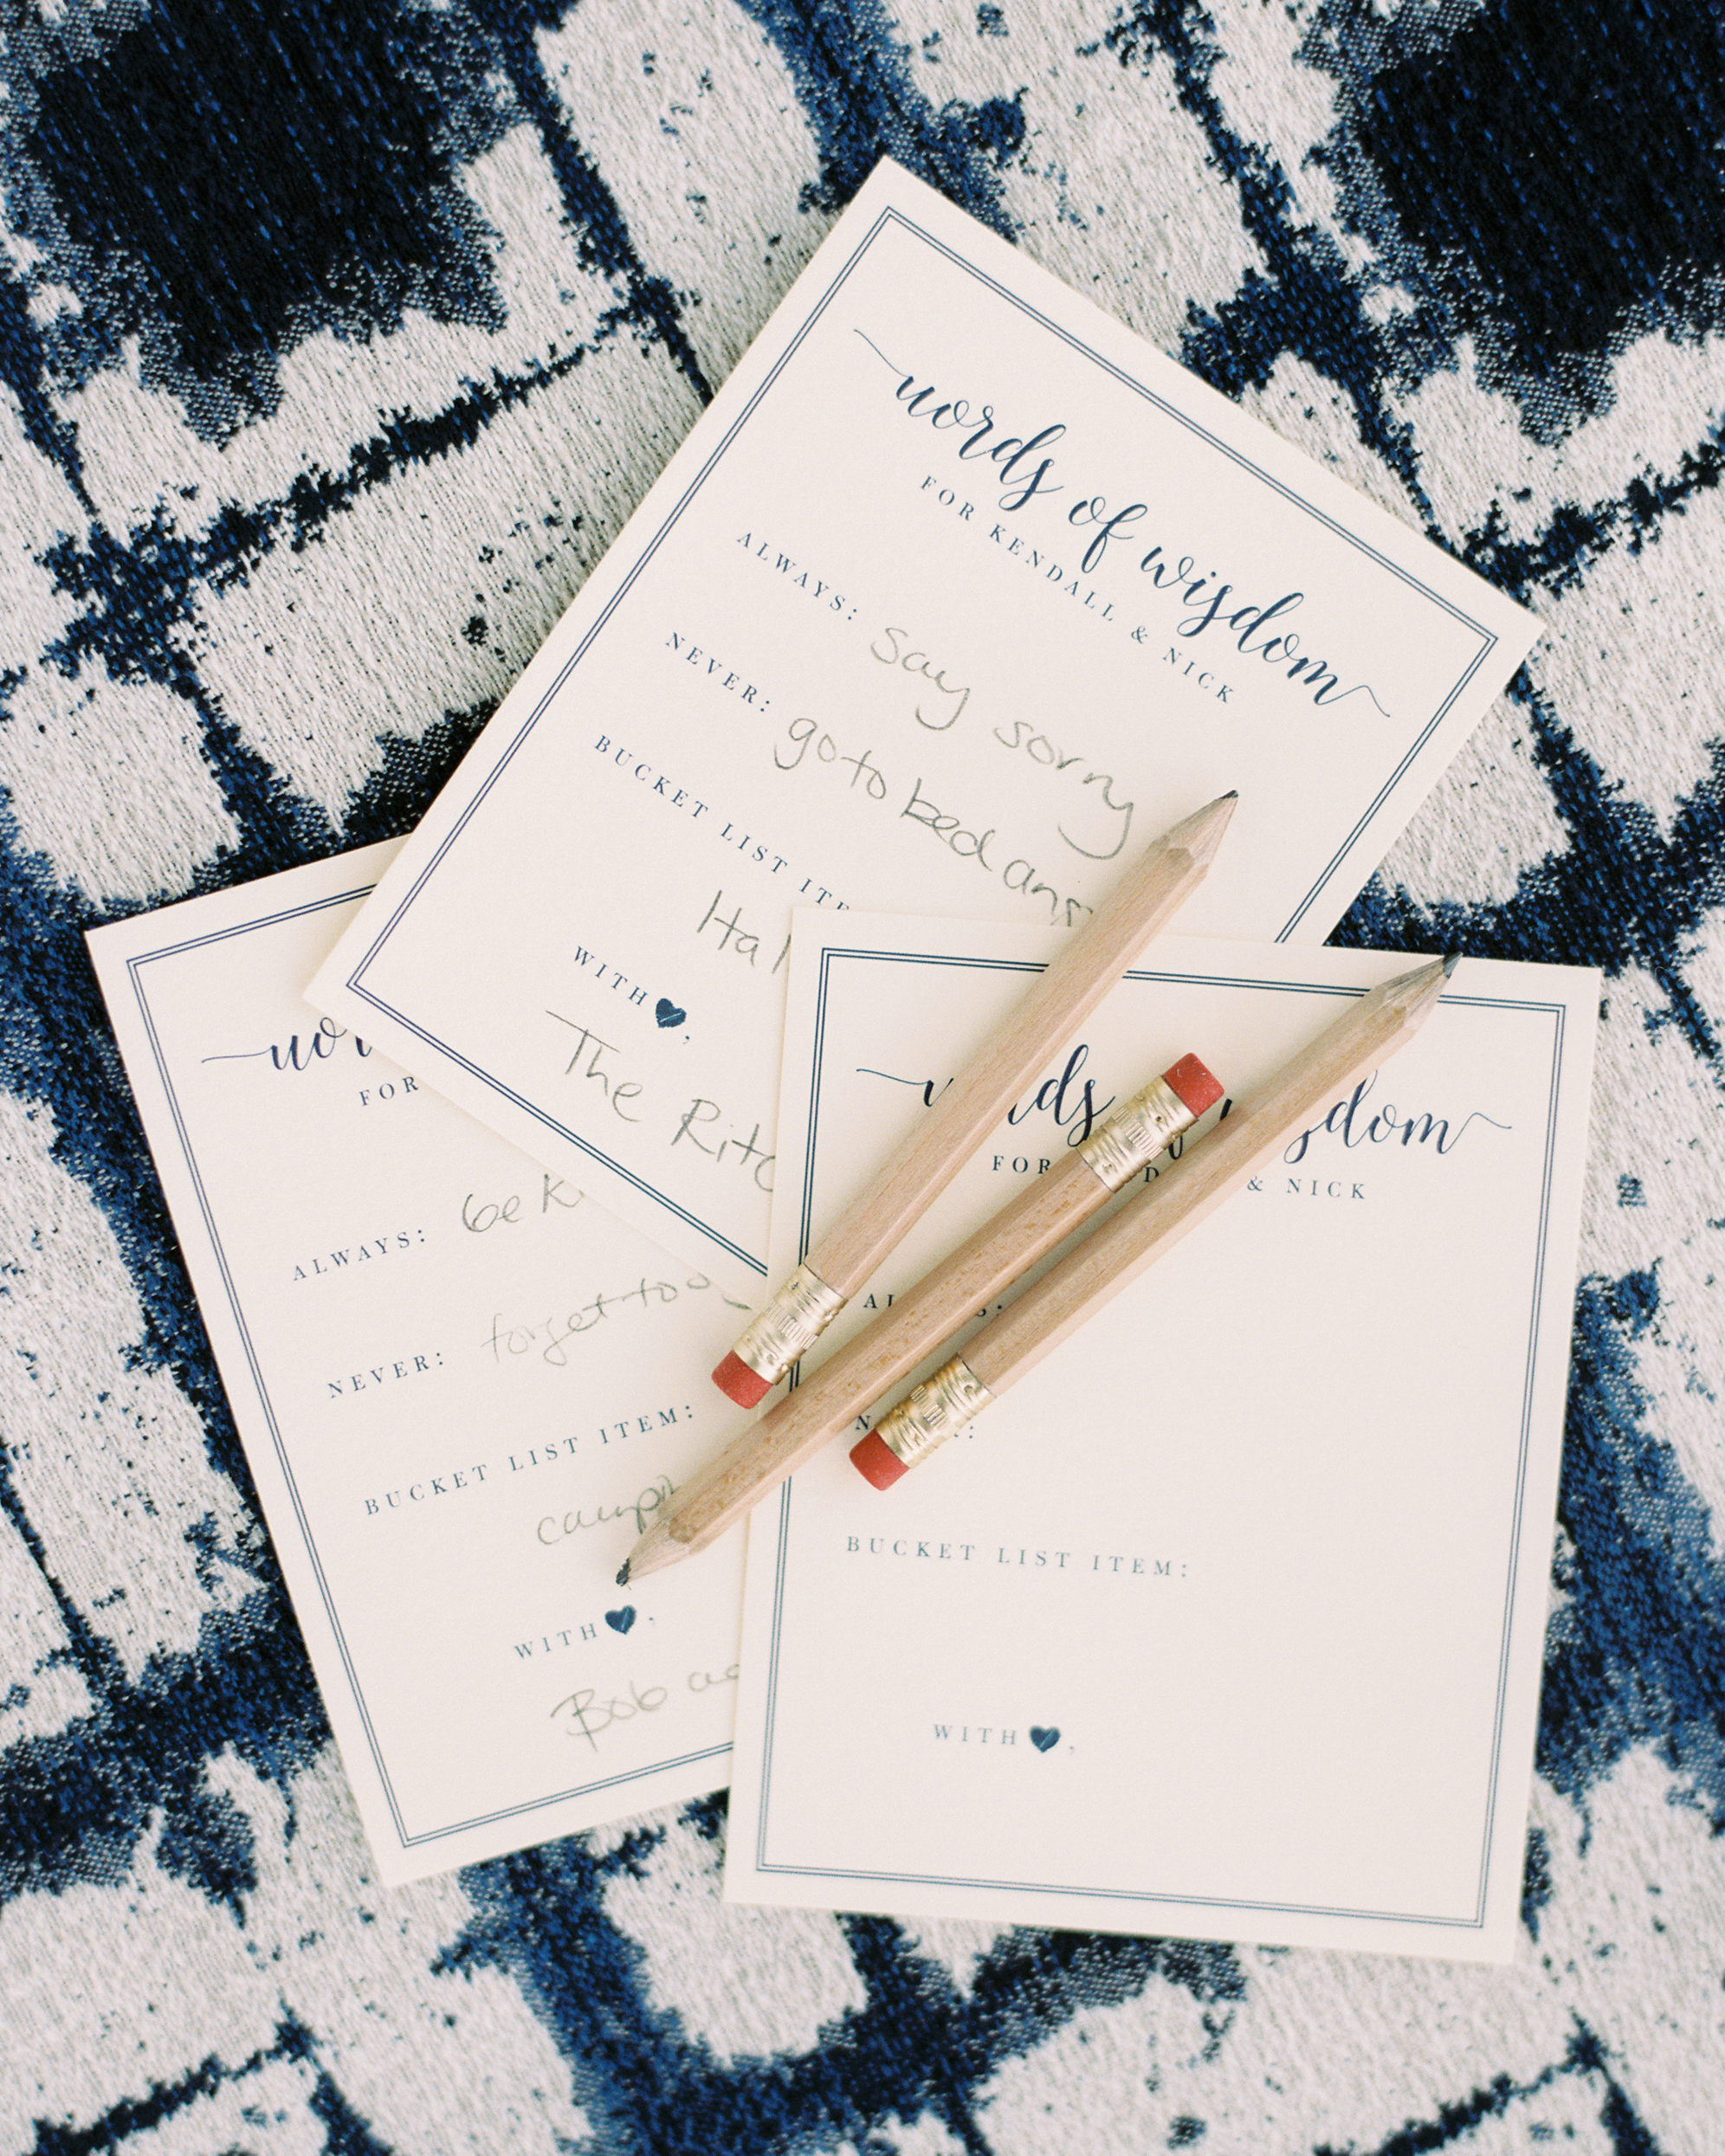 kendall nick wedding advice cards